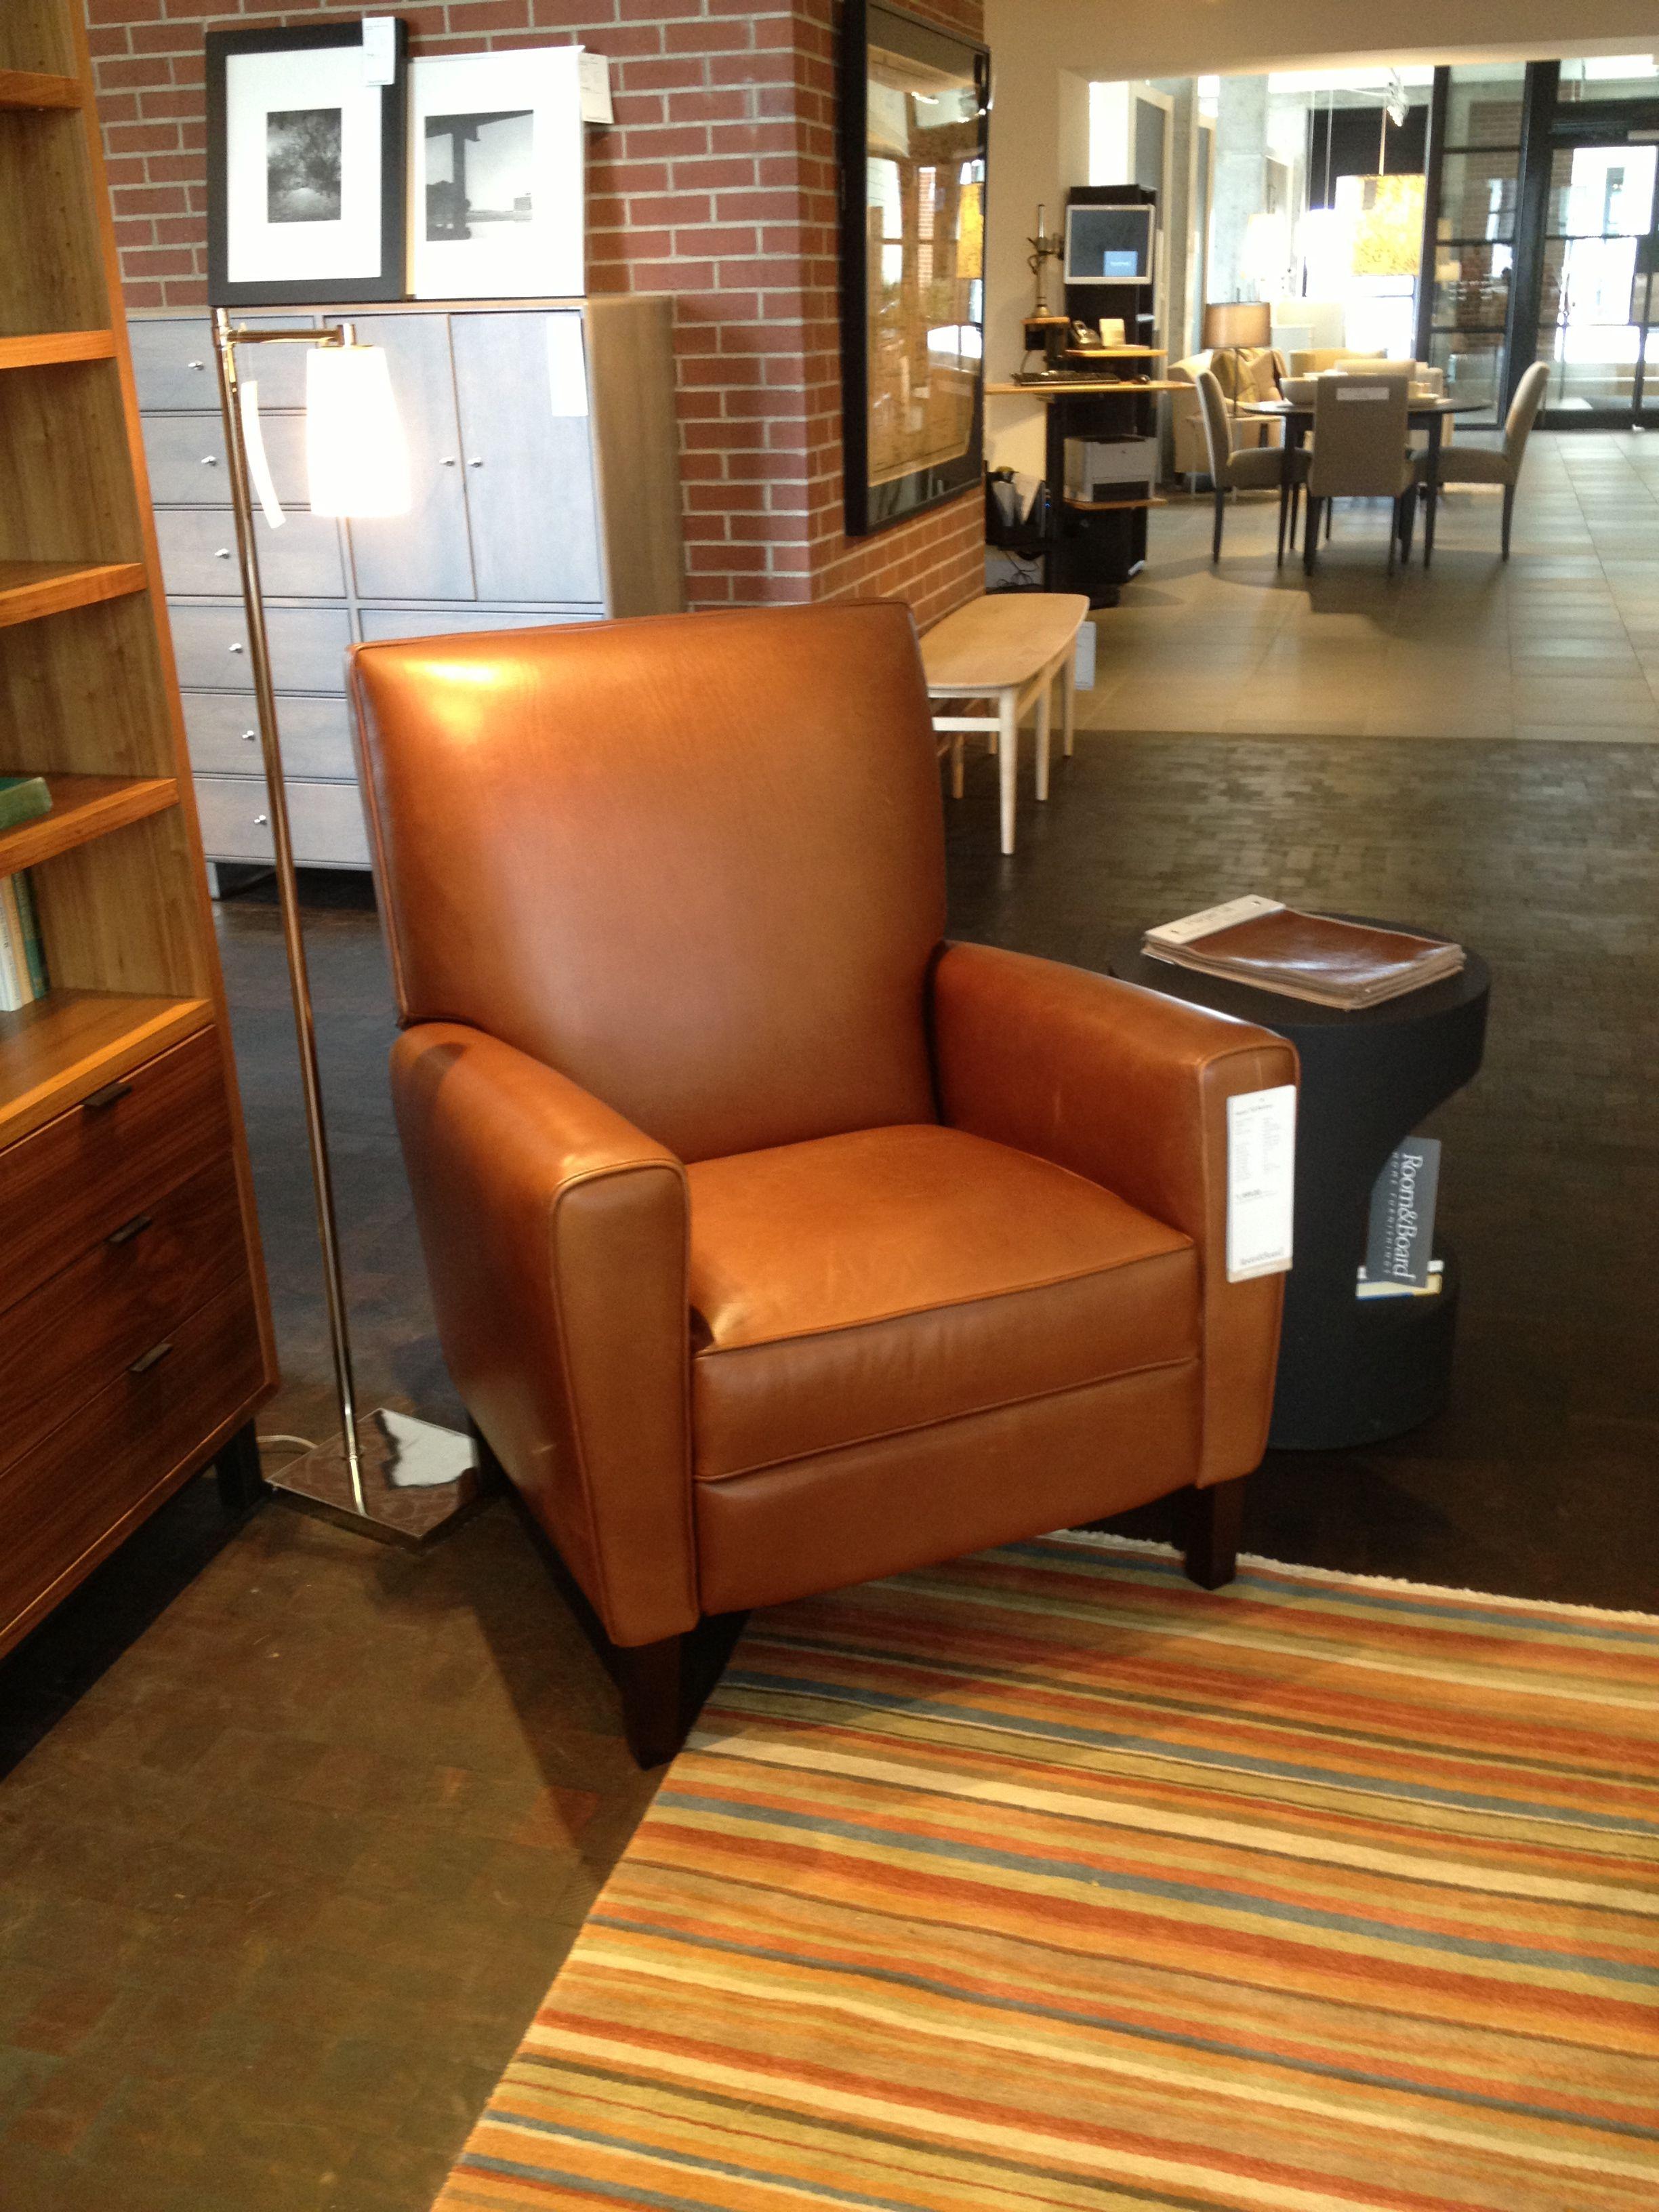 Lazy Boy Design A Room: Furniture, Home, Lazy Boy Recliner